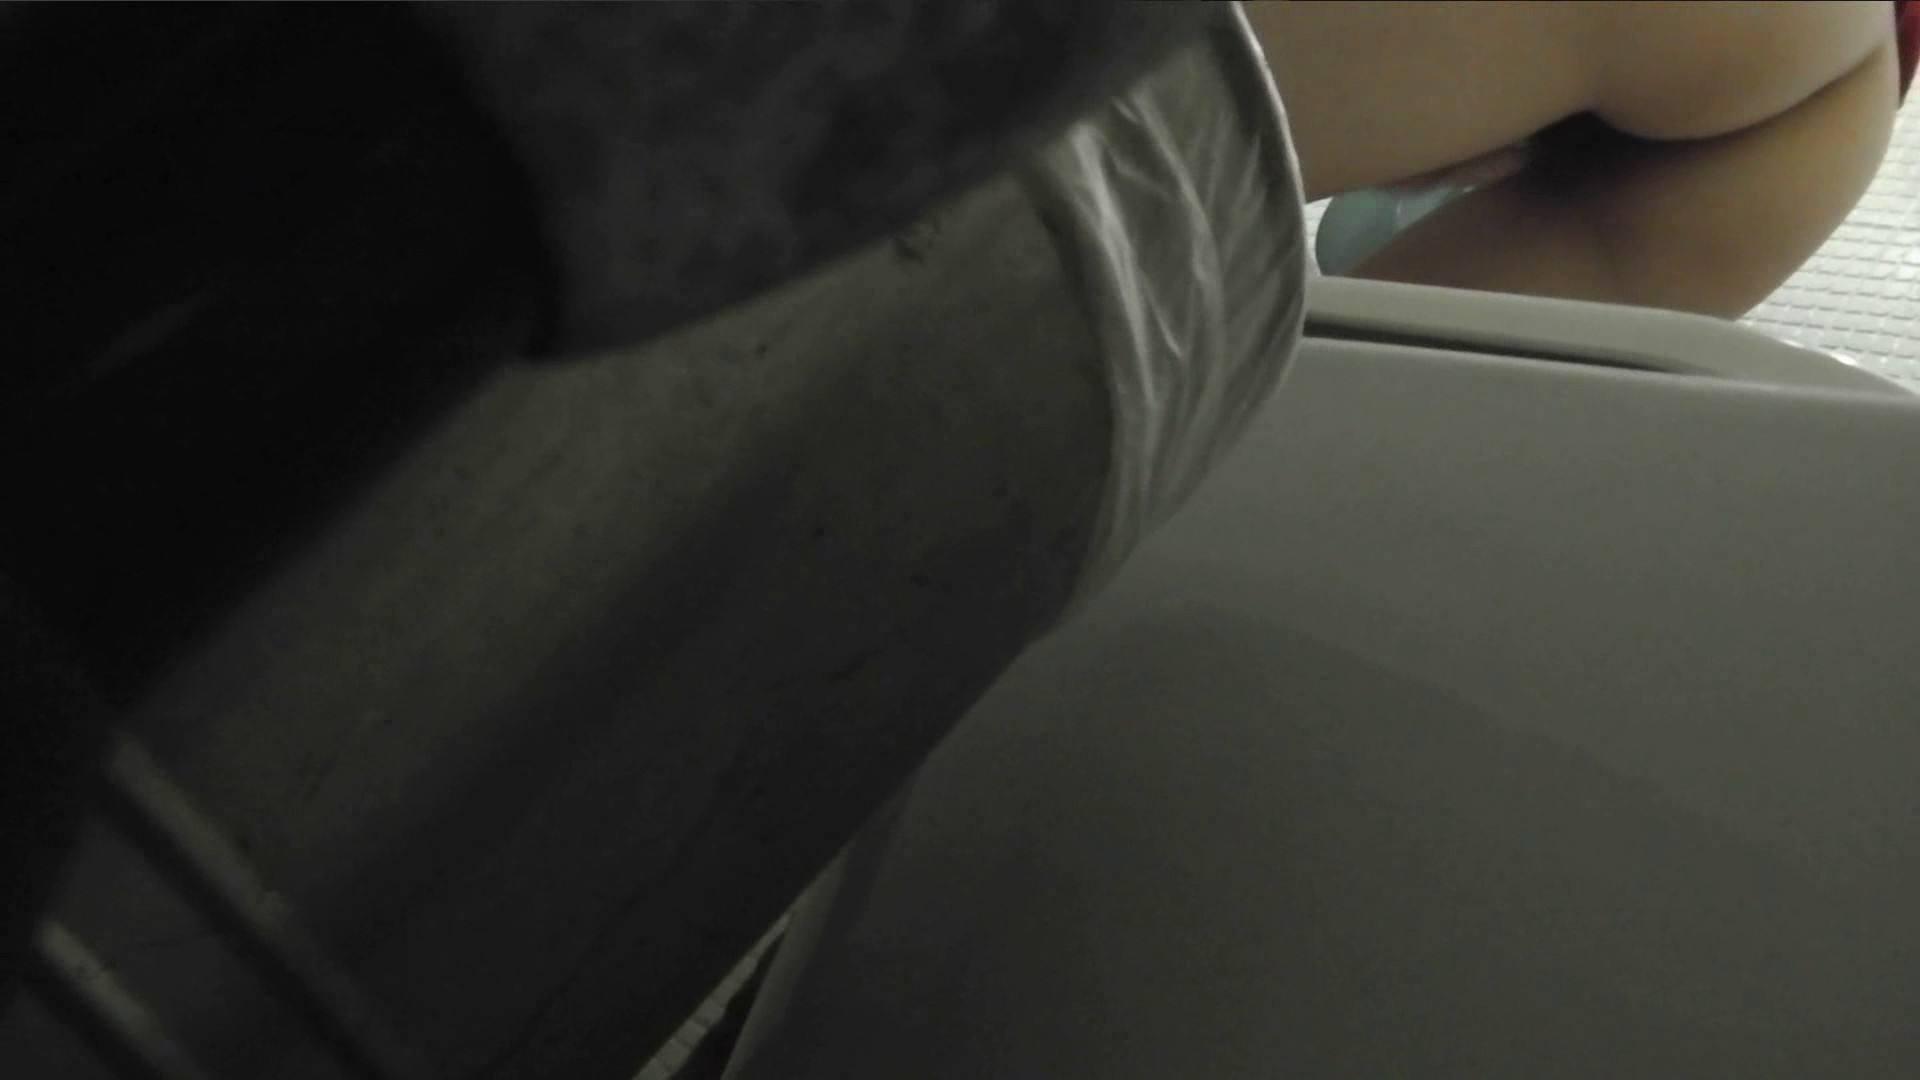 vol.02 着替えシーンもありマス OLの実態 覗きオメコ動画キャプチャ 52pic 5